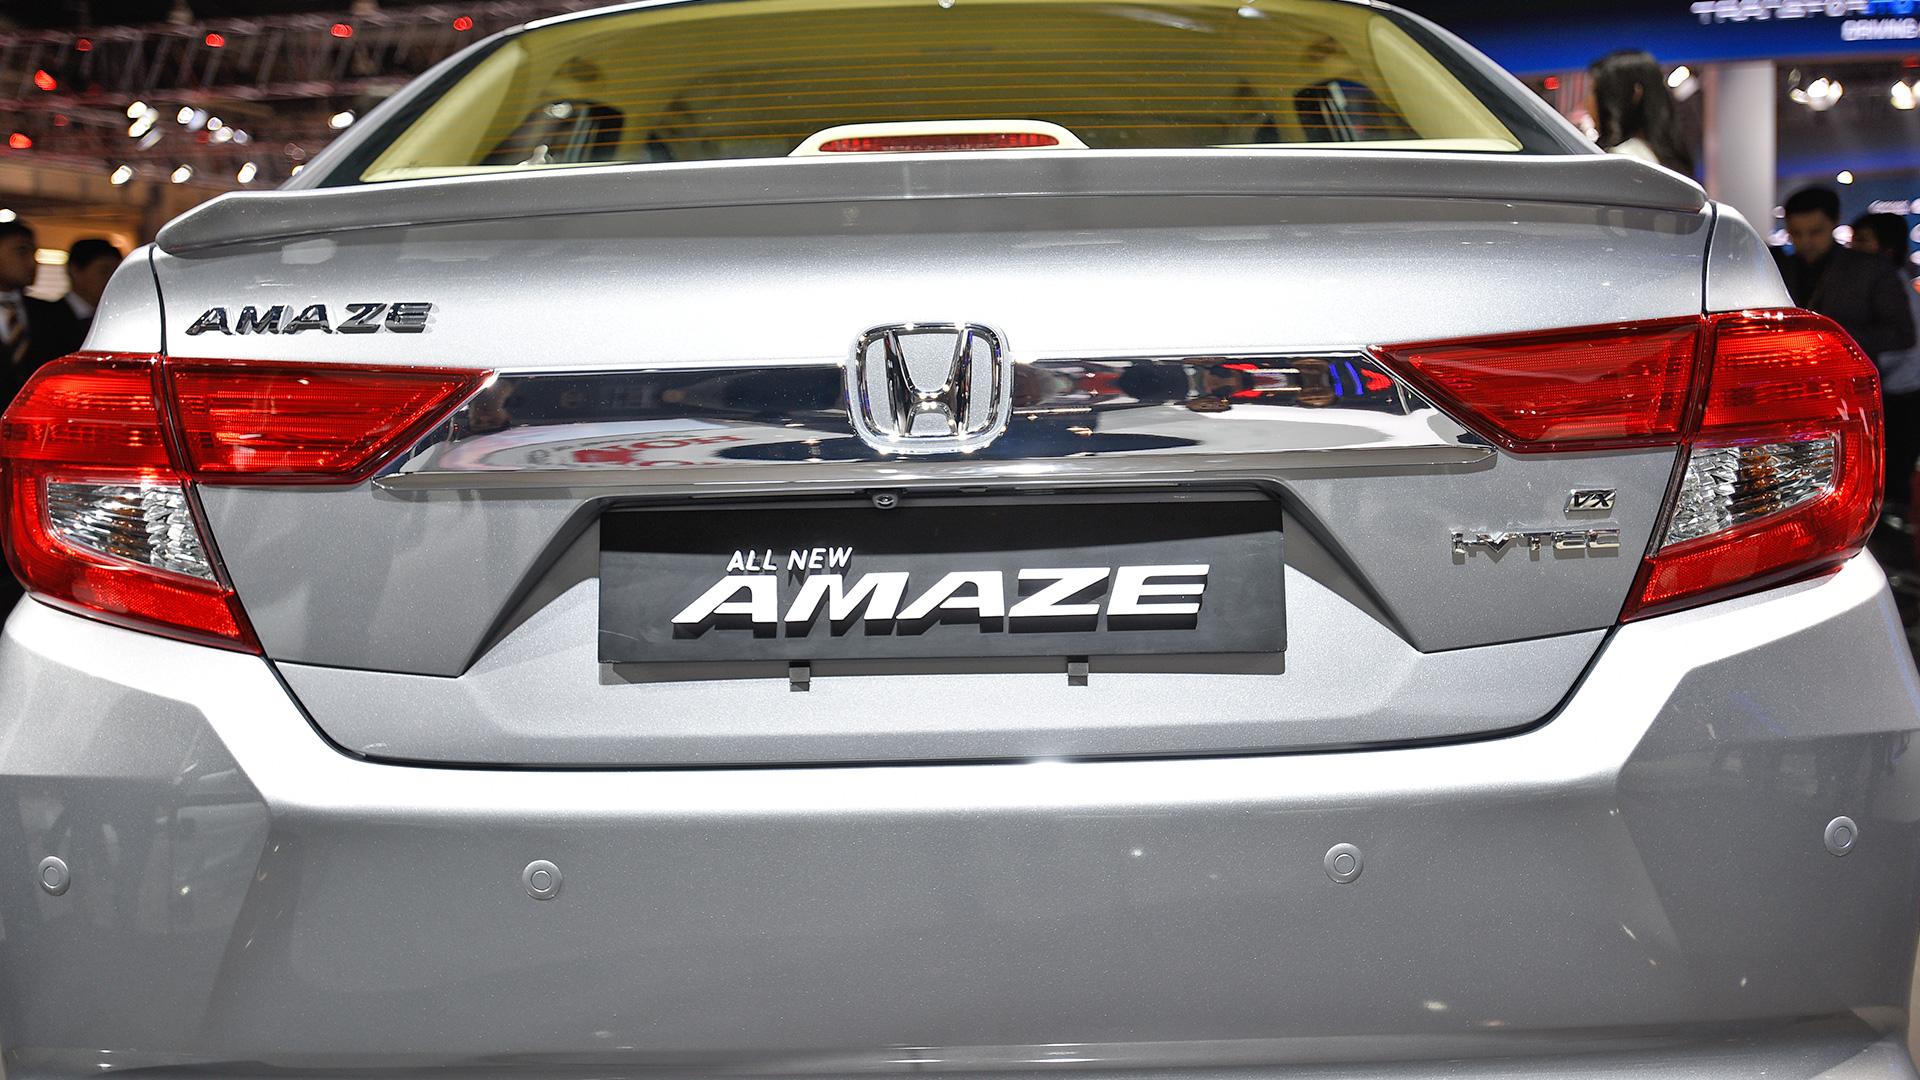 Honda Amaze 2018 Diesel Std Exterior Car Photos Overdrive